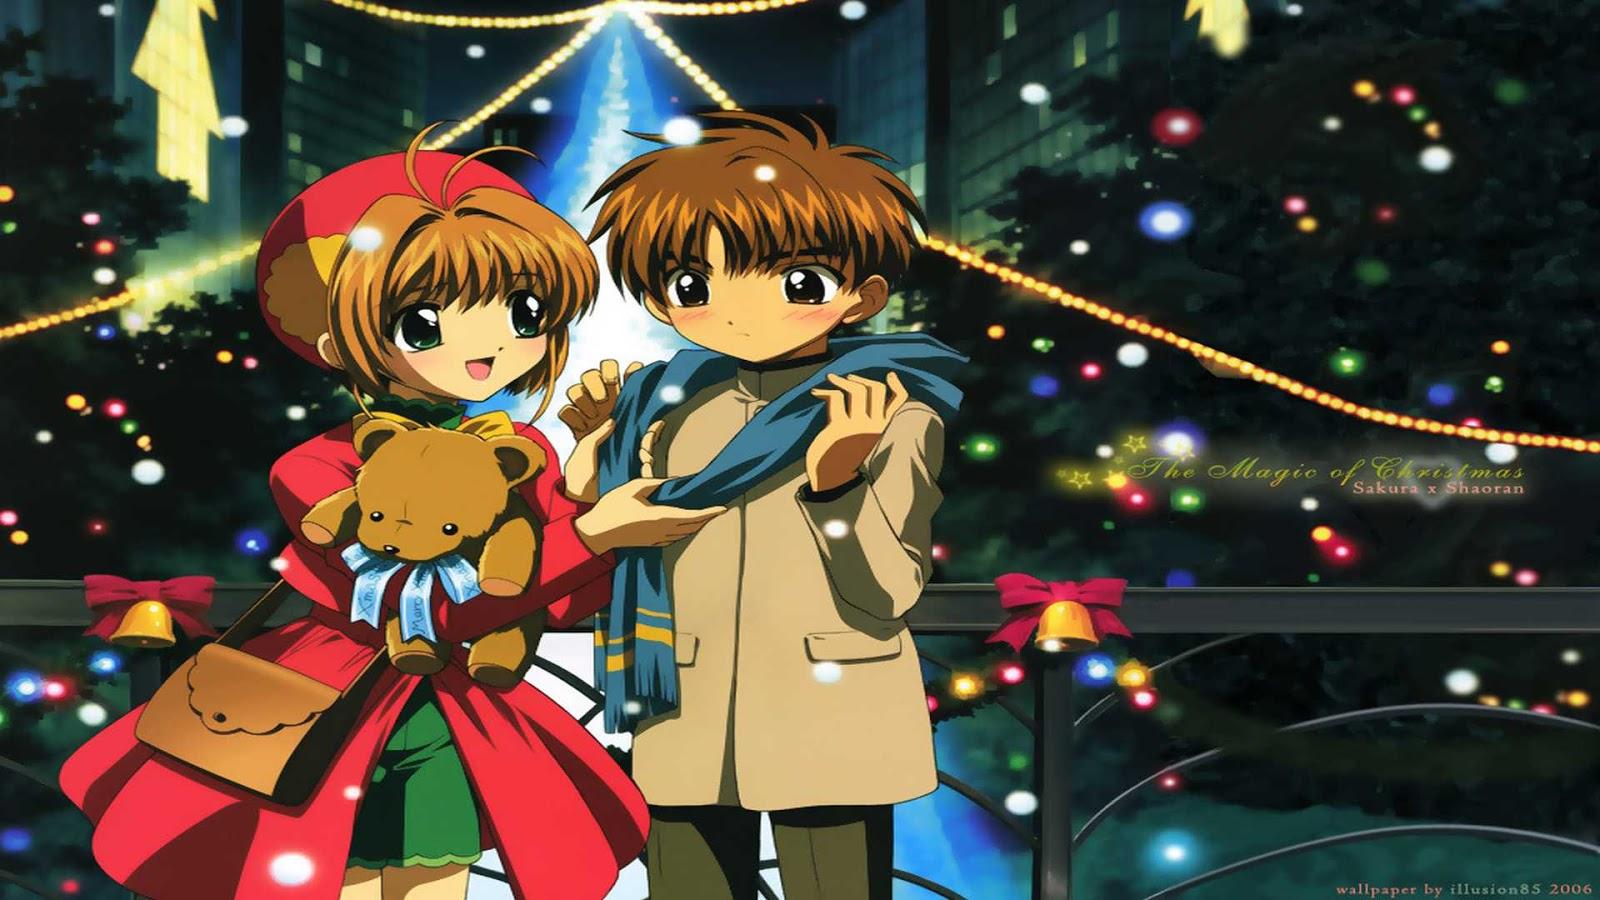 http://3.bp.blogspot.com/-TPTIdU1hCZc/UNzNkScsNyI/AAAAAAAA0QI/WL0f0ZRsShk/s1600/Wallpapers+Navidad+Anime+-+Merry+Christmas+(8)+-+1920x1080.jpg